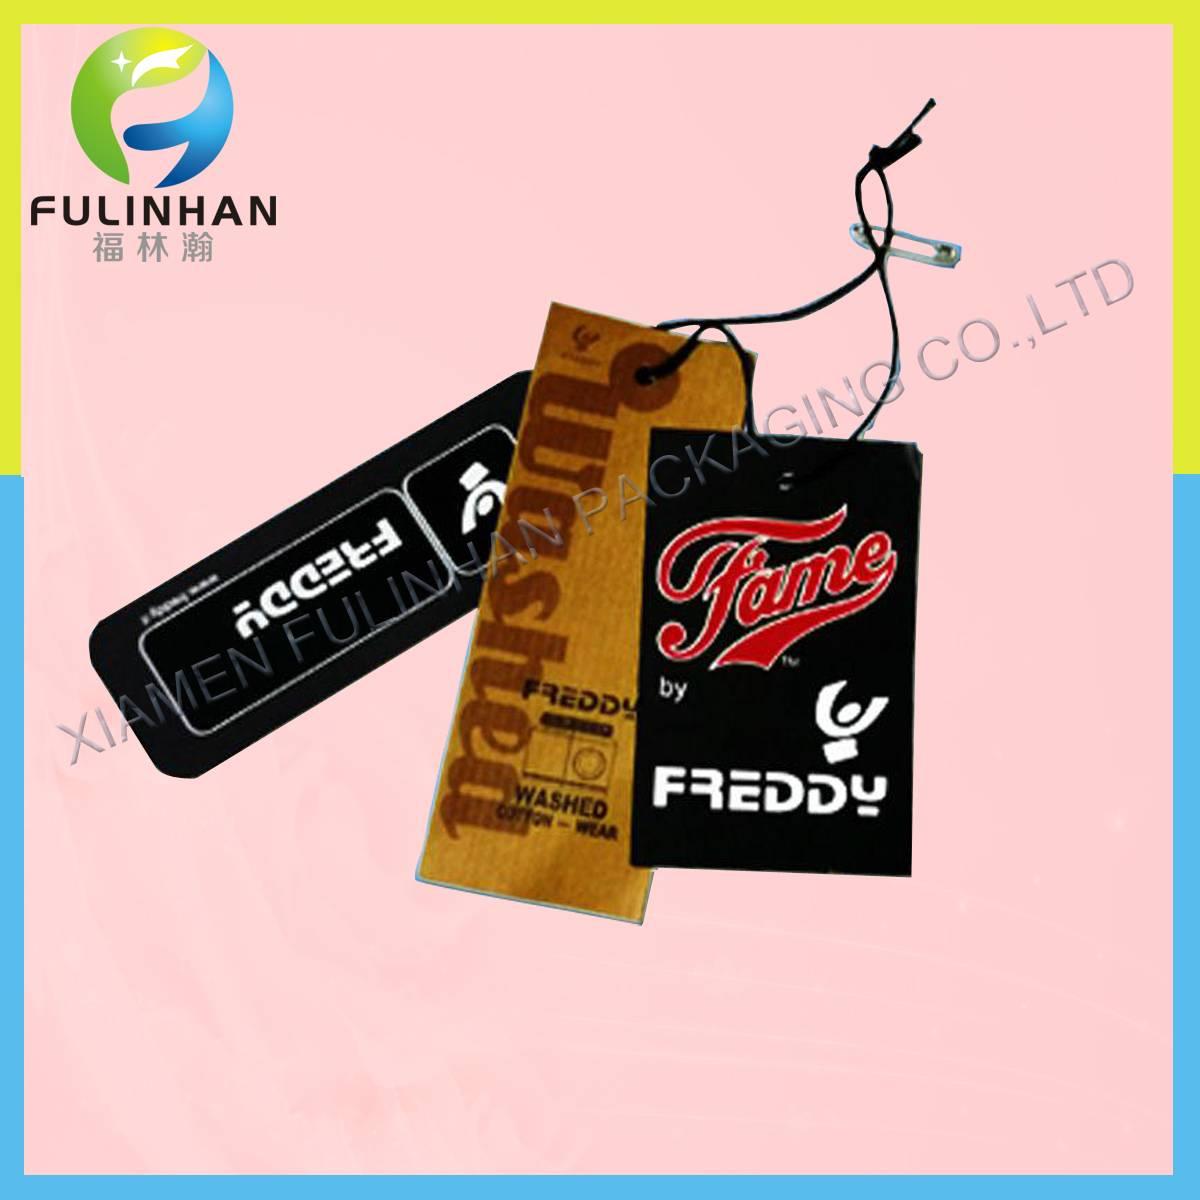 Composed Hang tag